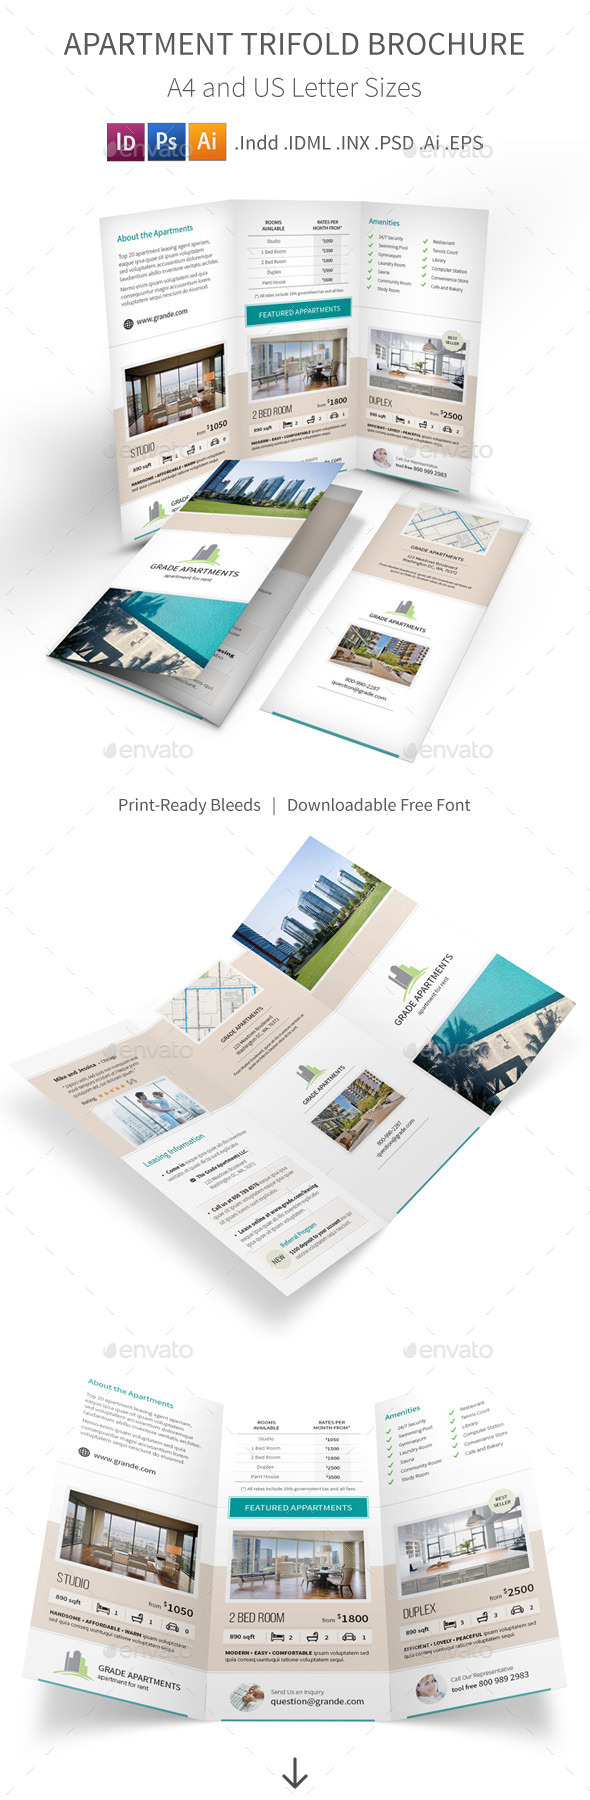 apartment brochure templates - print template graphicriver apartment real estate